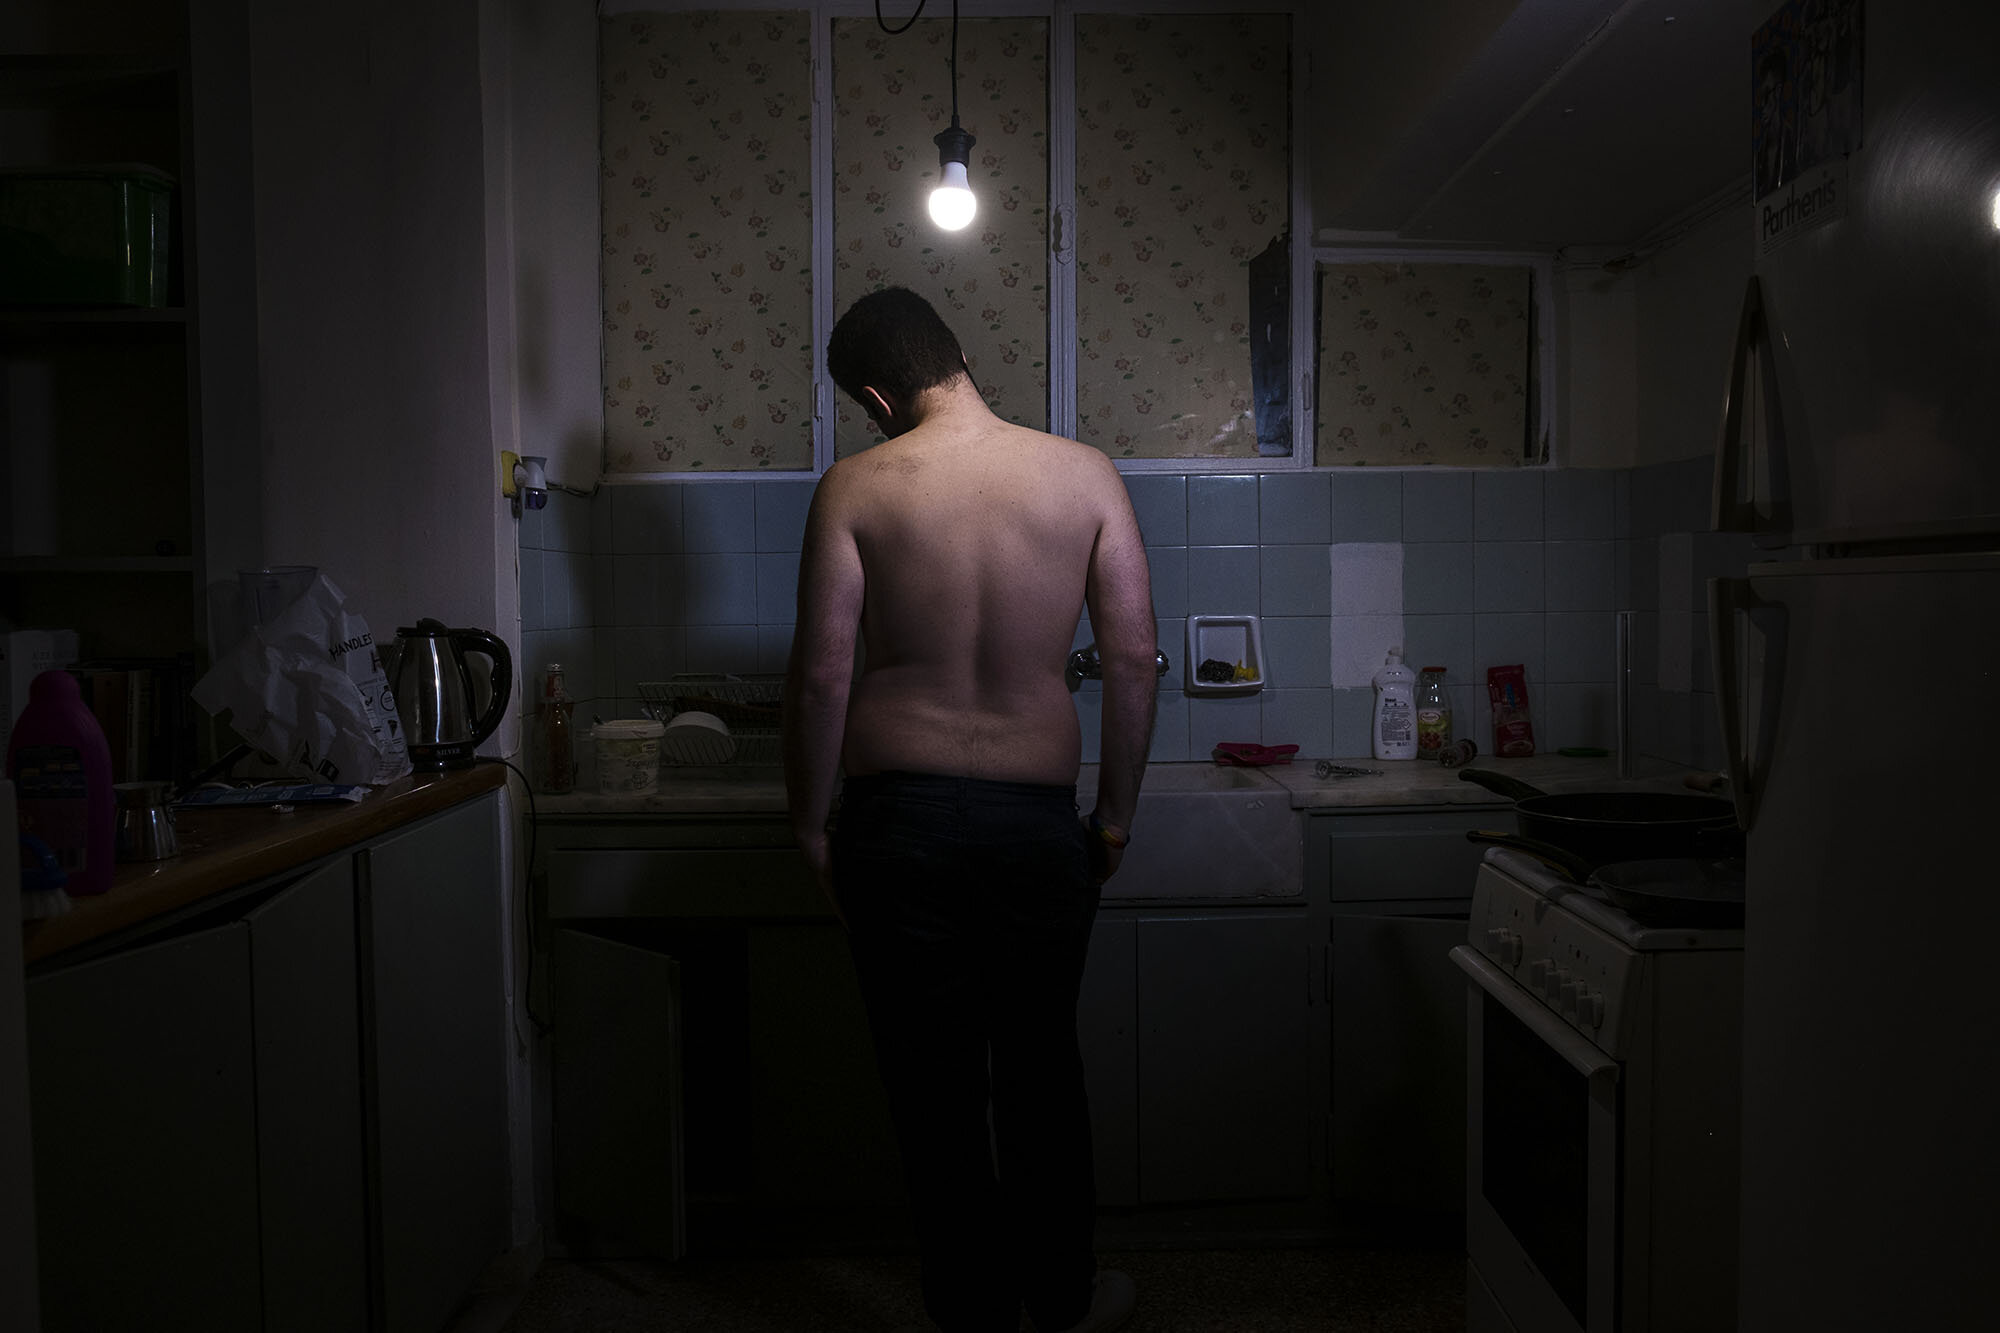 Greece | The body in crisis - Trapani inPhoto festivalTrapani | Italy